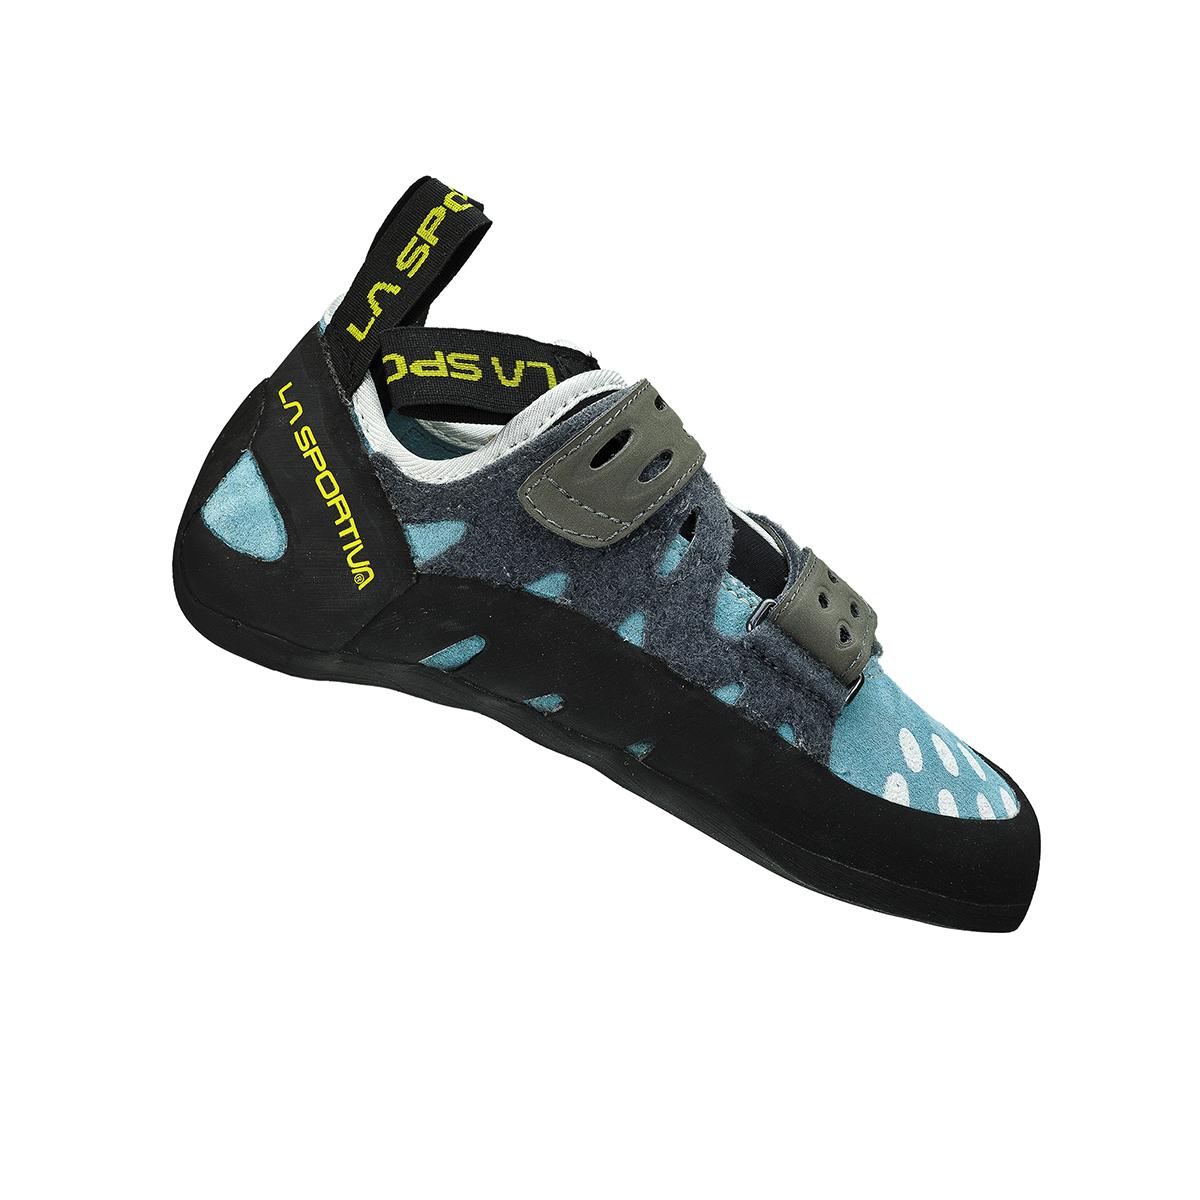 7bc4653a4892 ... La Sportiva Tarantula Women s Trad Multi-Pitch Boulder All-round rock  climbing shoe. Turquoise